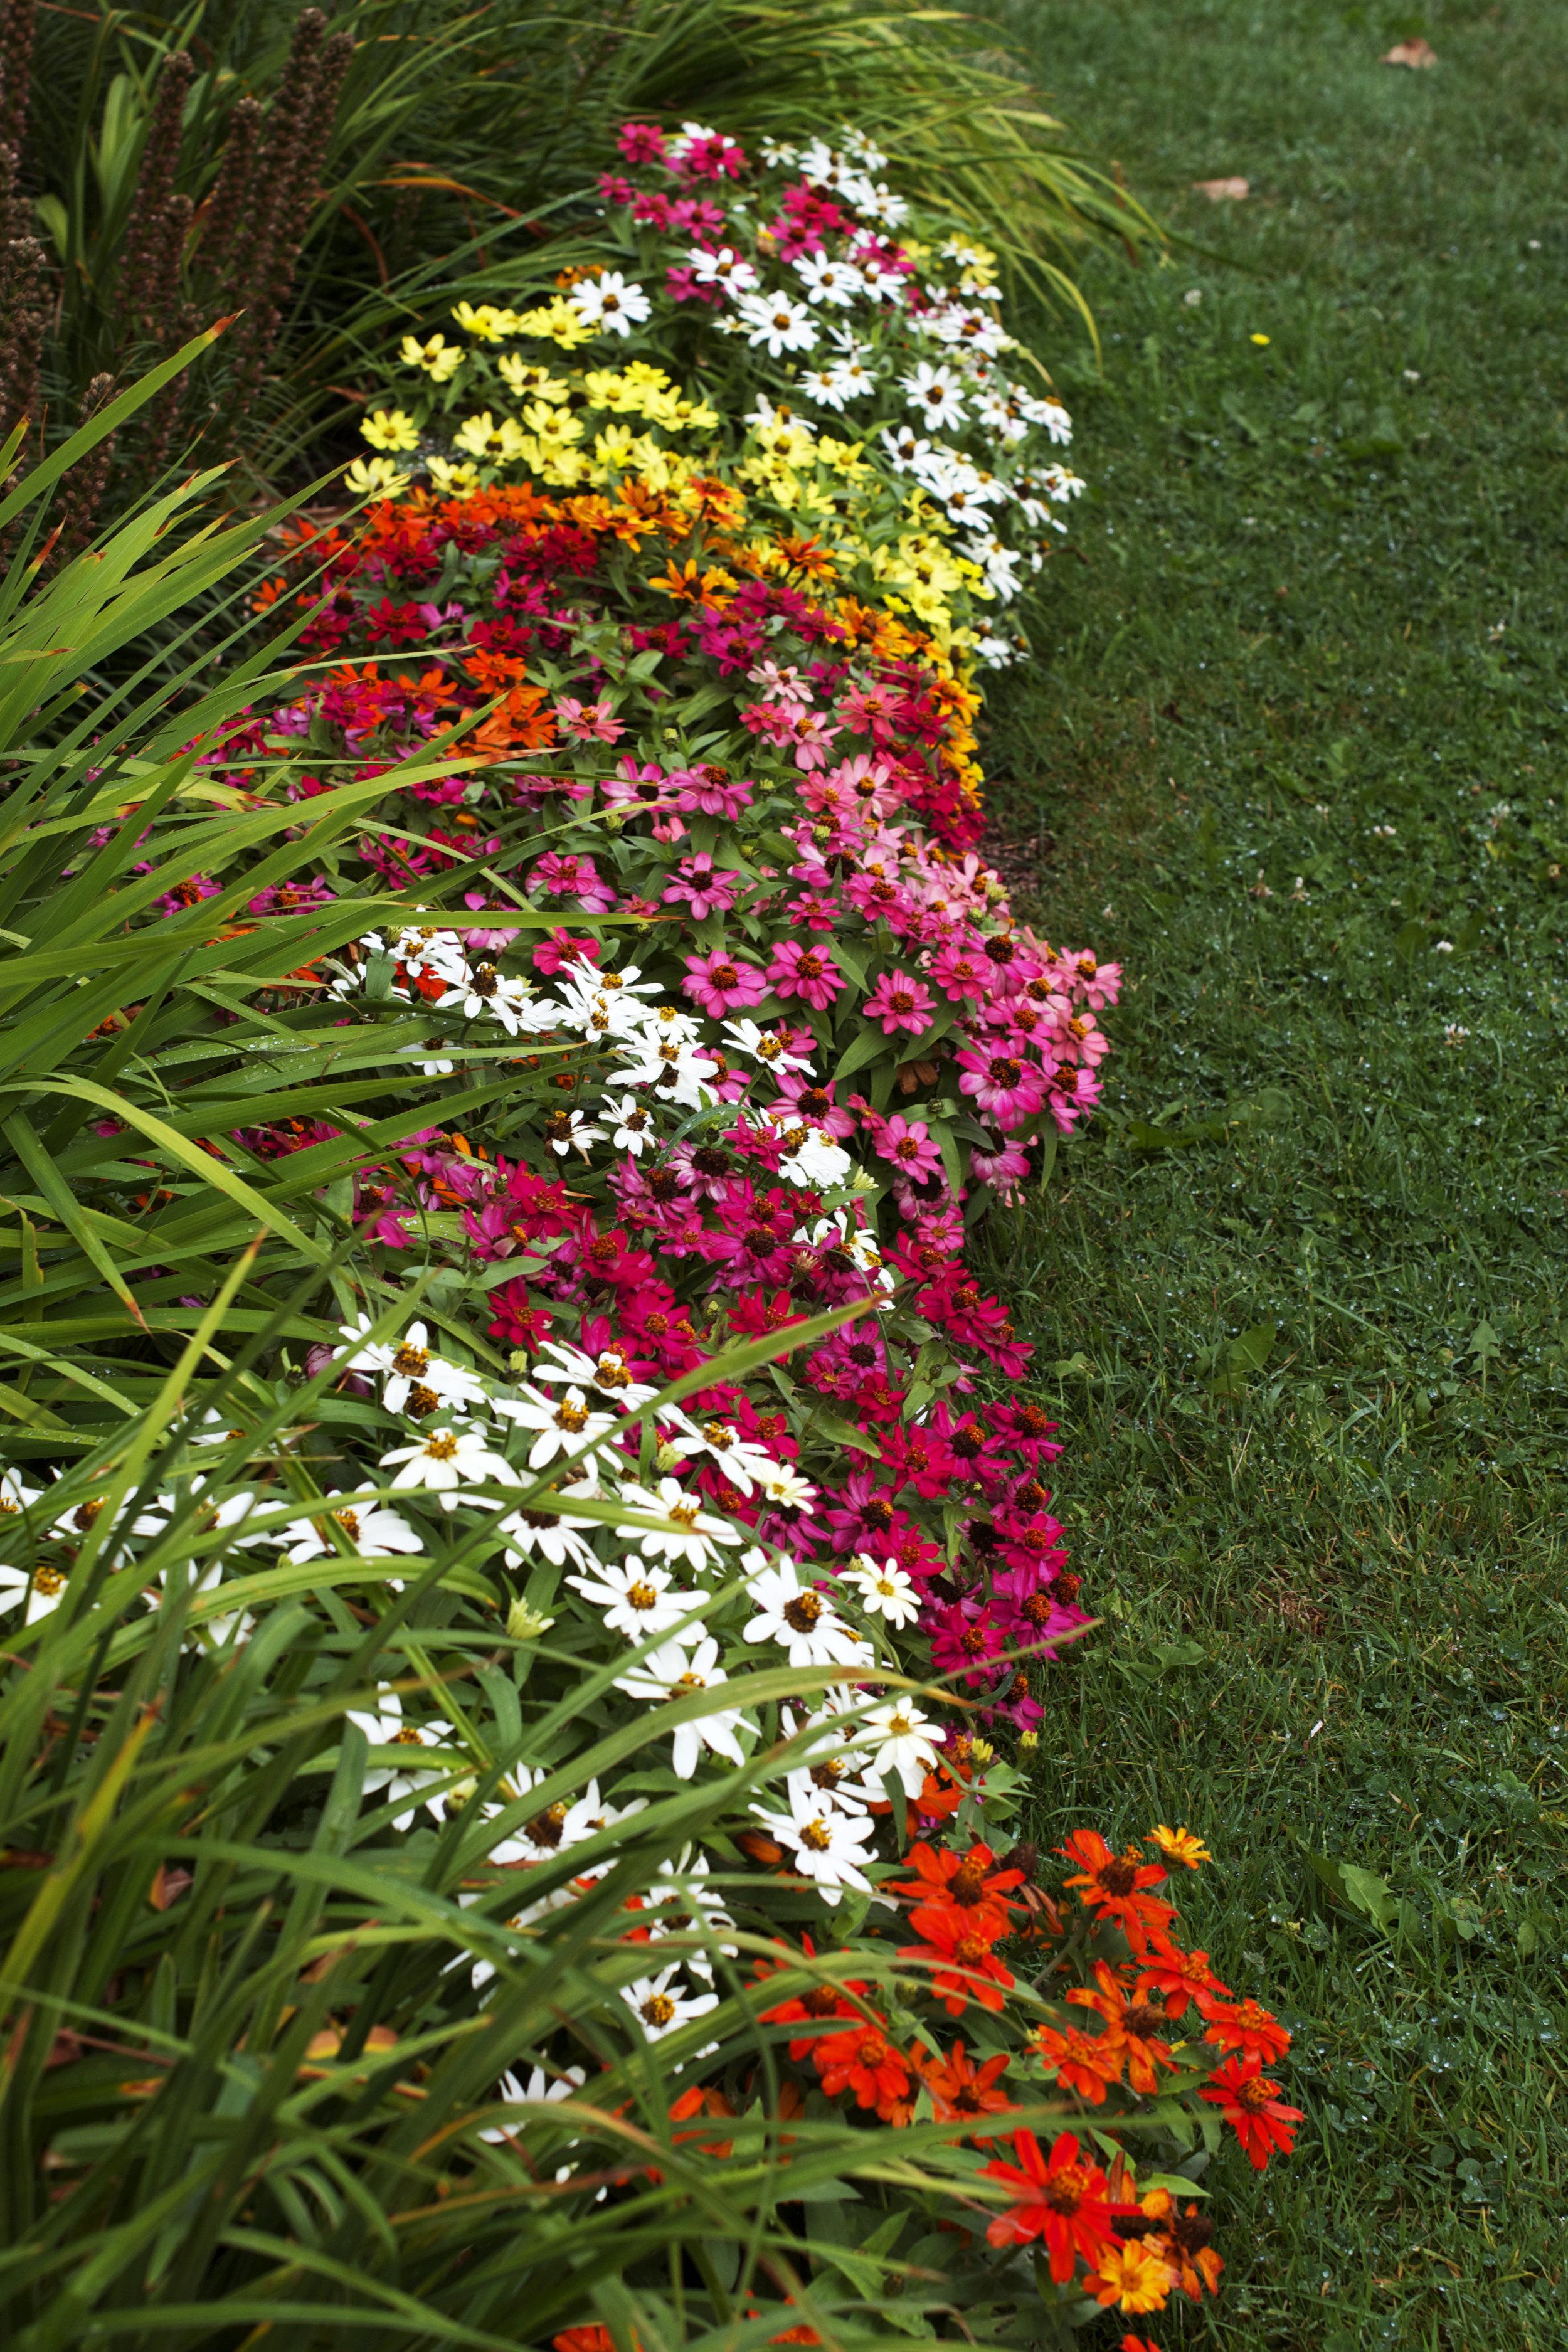 colourful-flower-bed.jpg